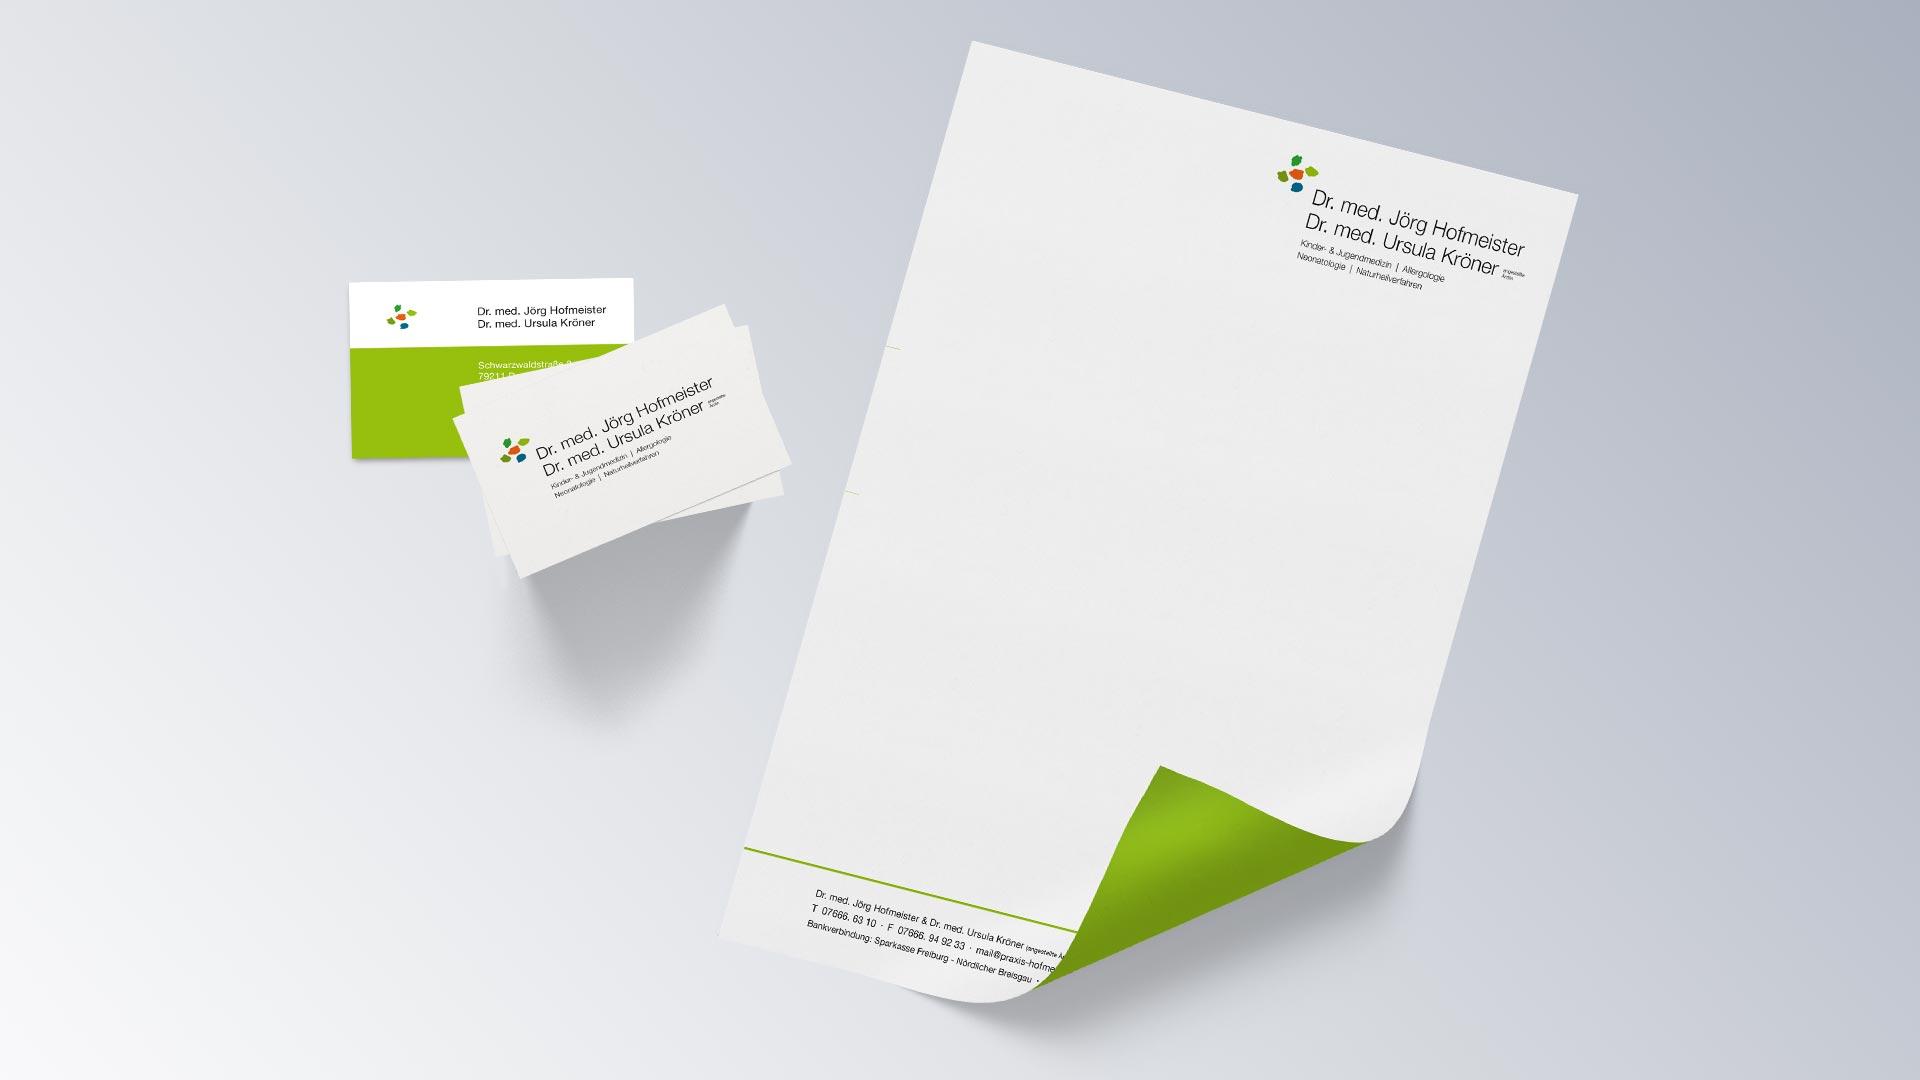 Praxis Dr. Jörg Hofmeister Kinderarzt Denzlingen Visitenkarte Briefbogen